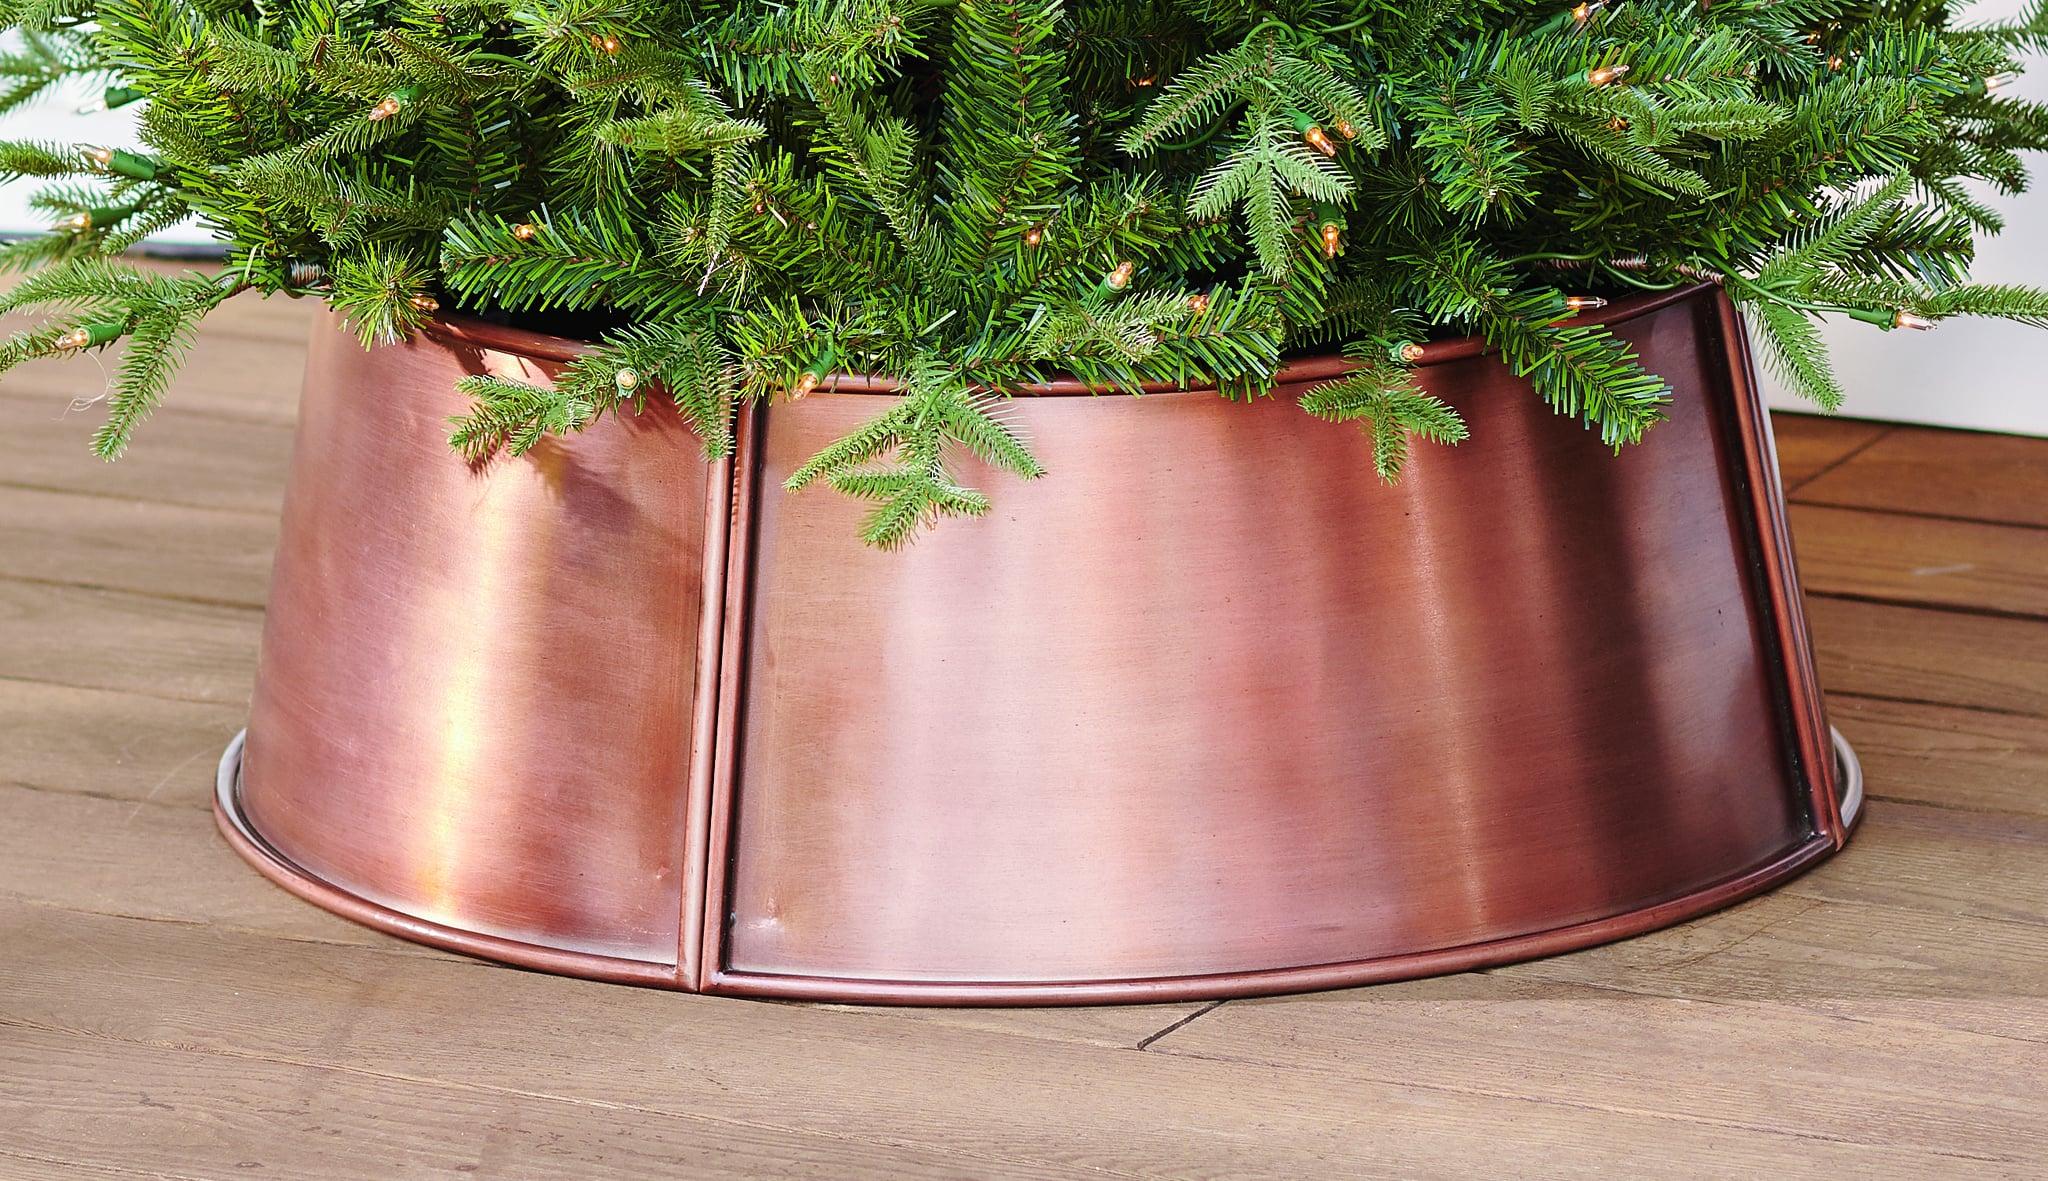 Metal Tree Collar Best 2019 Christmas Decor At Grandin Road Popsugar Home Australia Photo 19